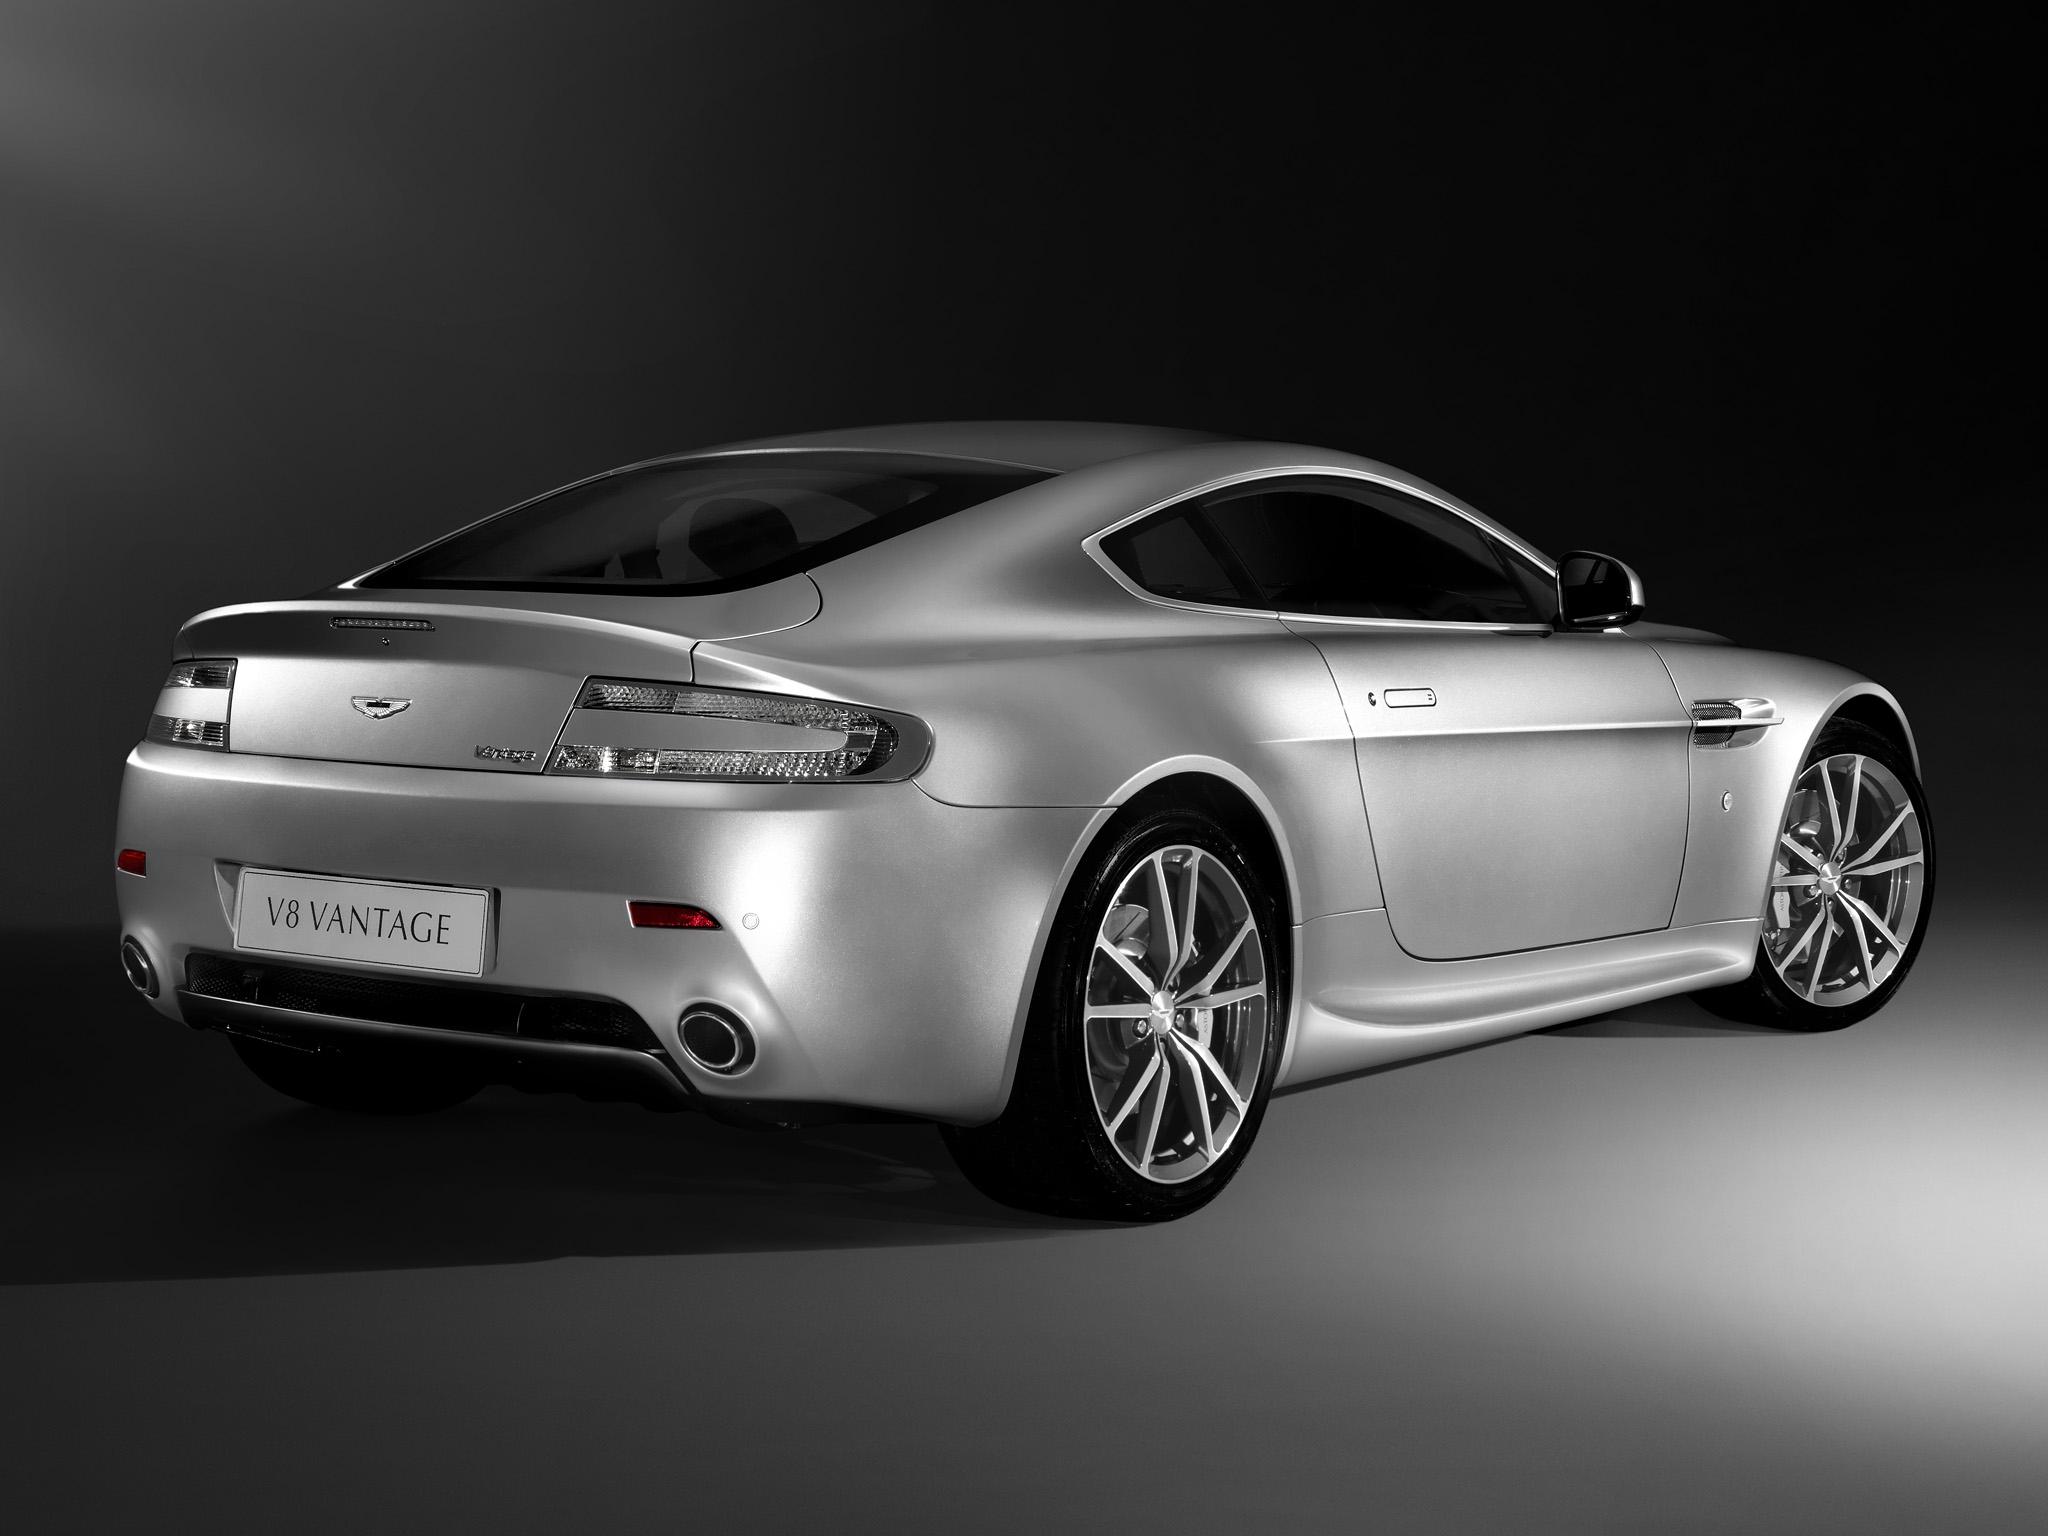 Wallpaper Side View Sports Car Aston Martin Aston Martin Dbs